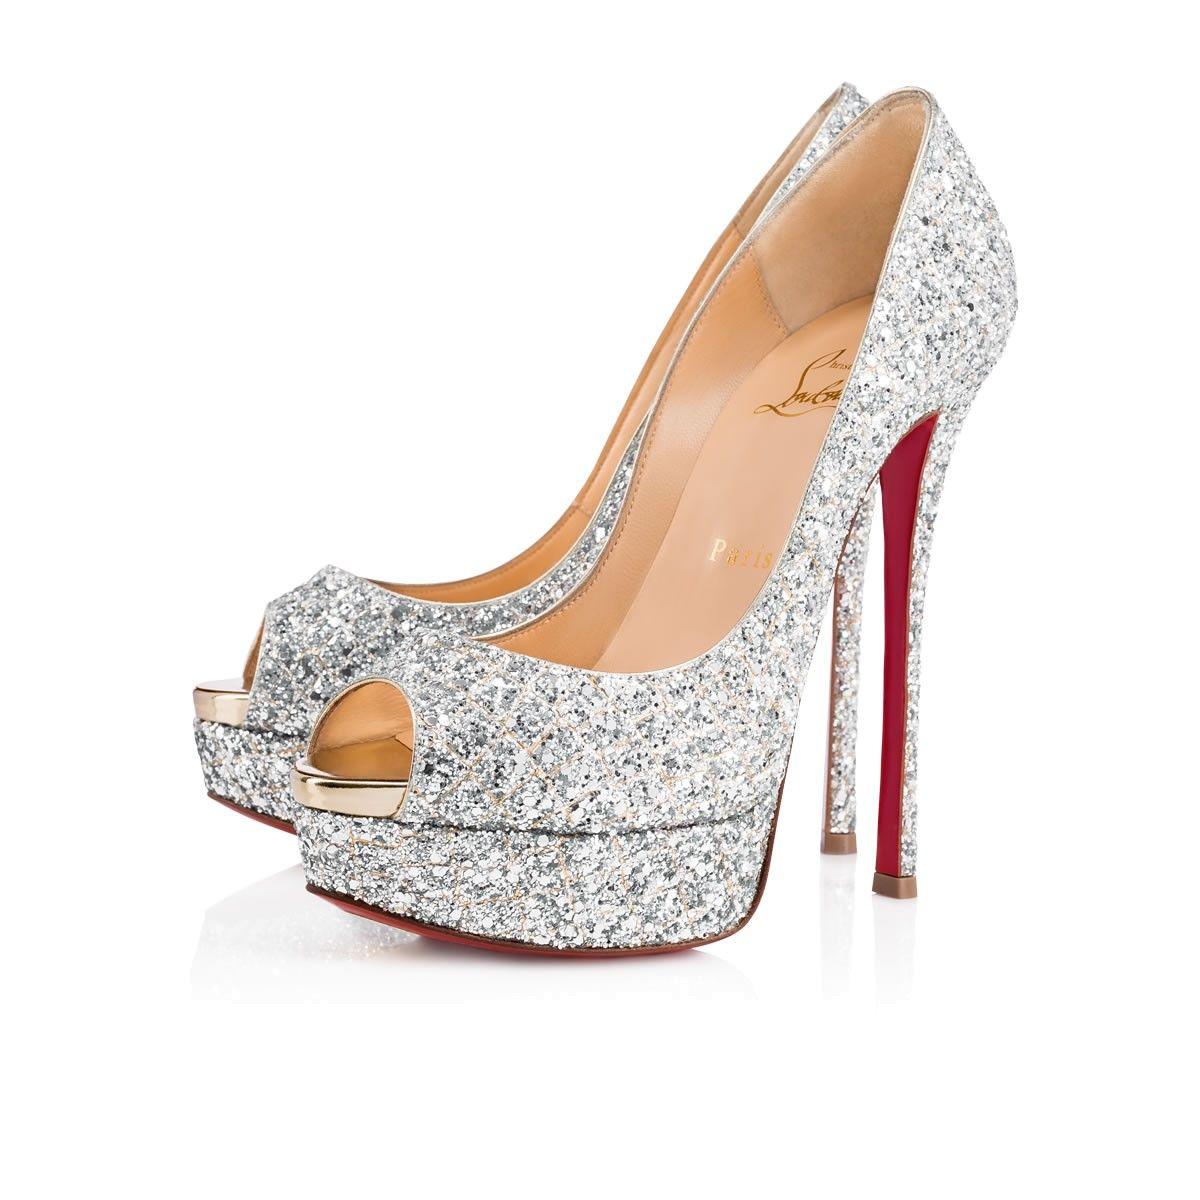 5888176d453 CHRISTIAN LOUBOUTIN .  christianlouboutin  shoes